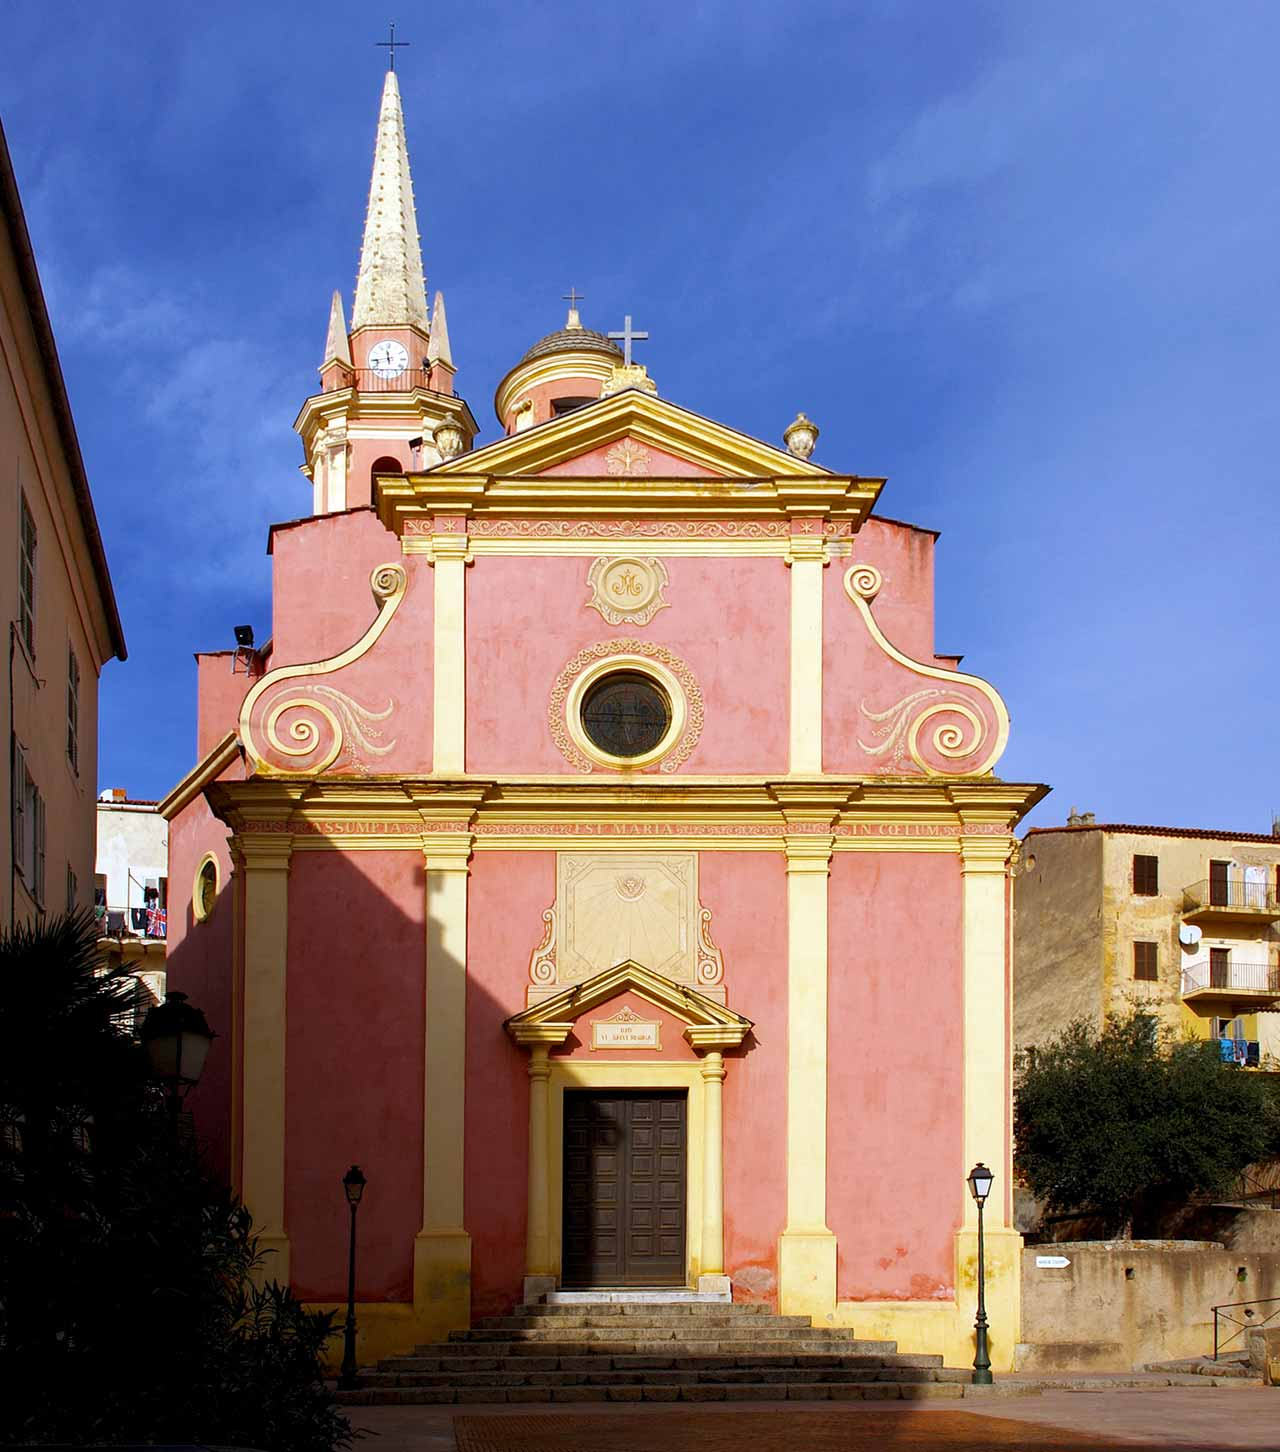 Eglise Sainte-Marie-Majeure